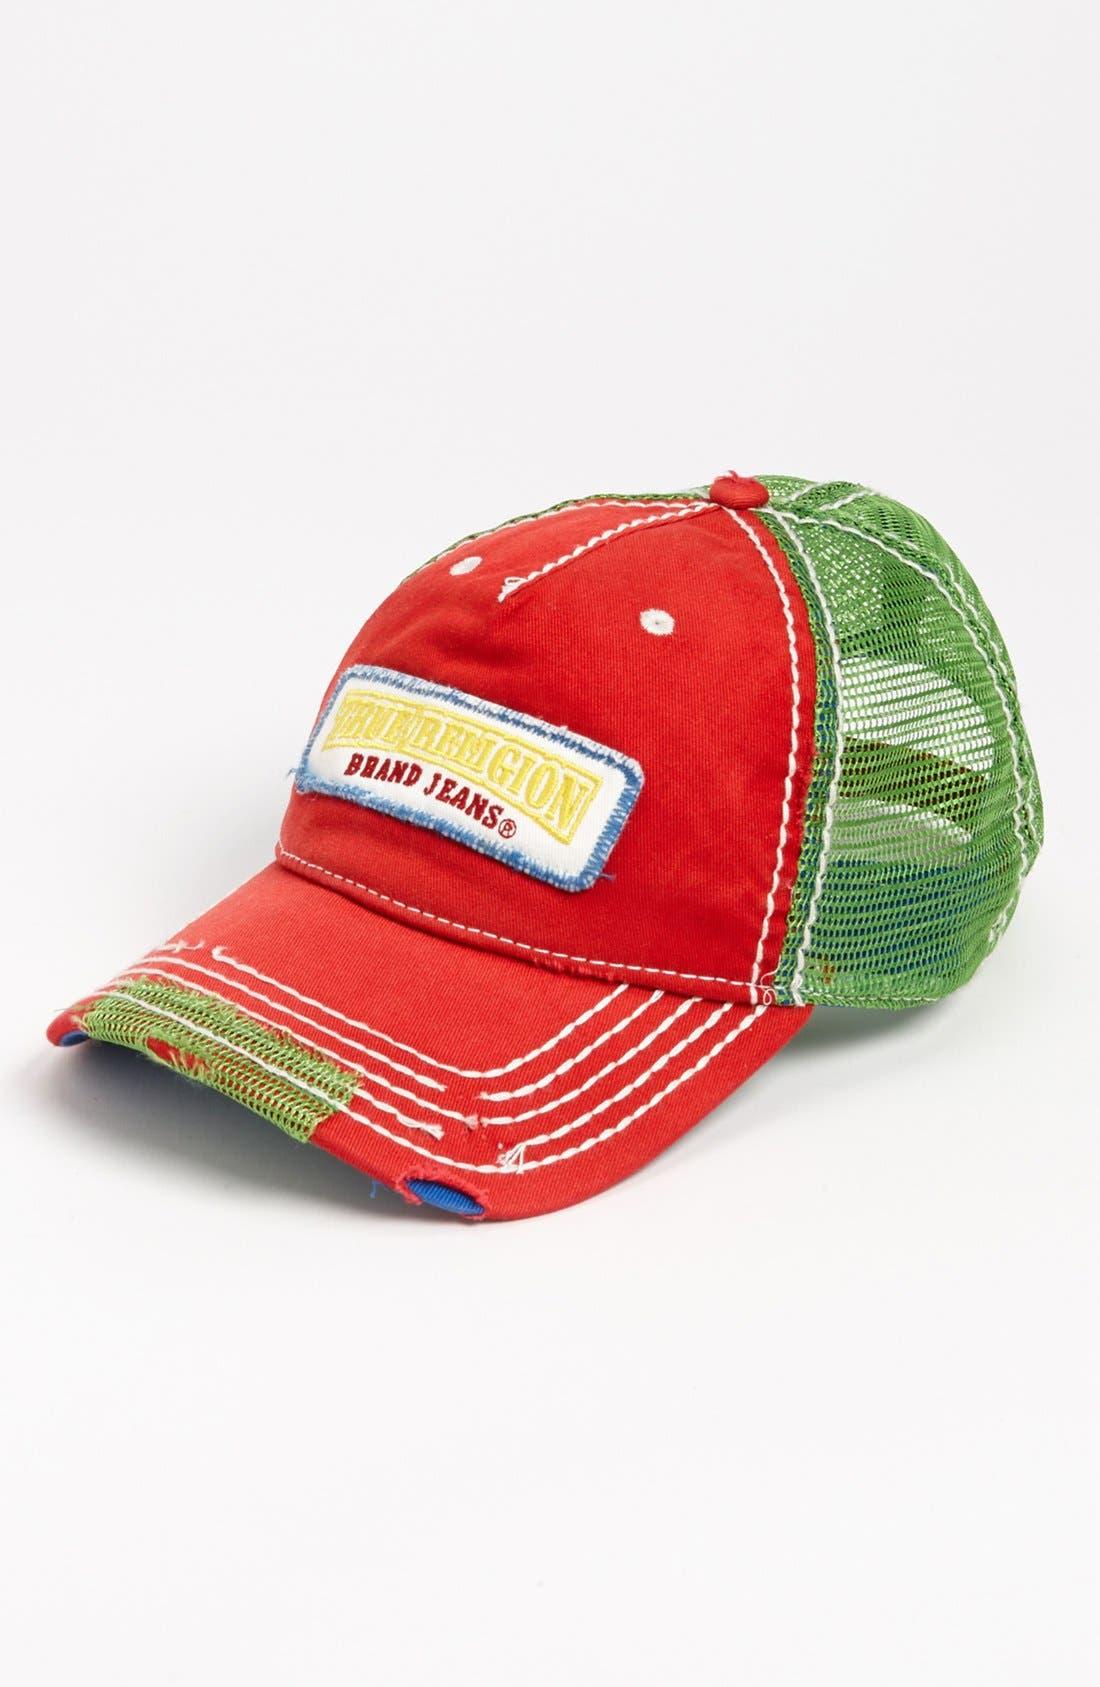 Main Image - True Religion Brand Jeans Trucker Hat